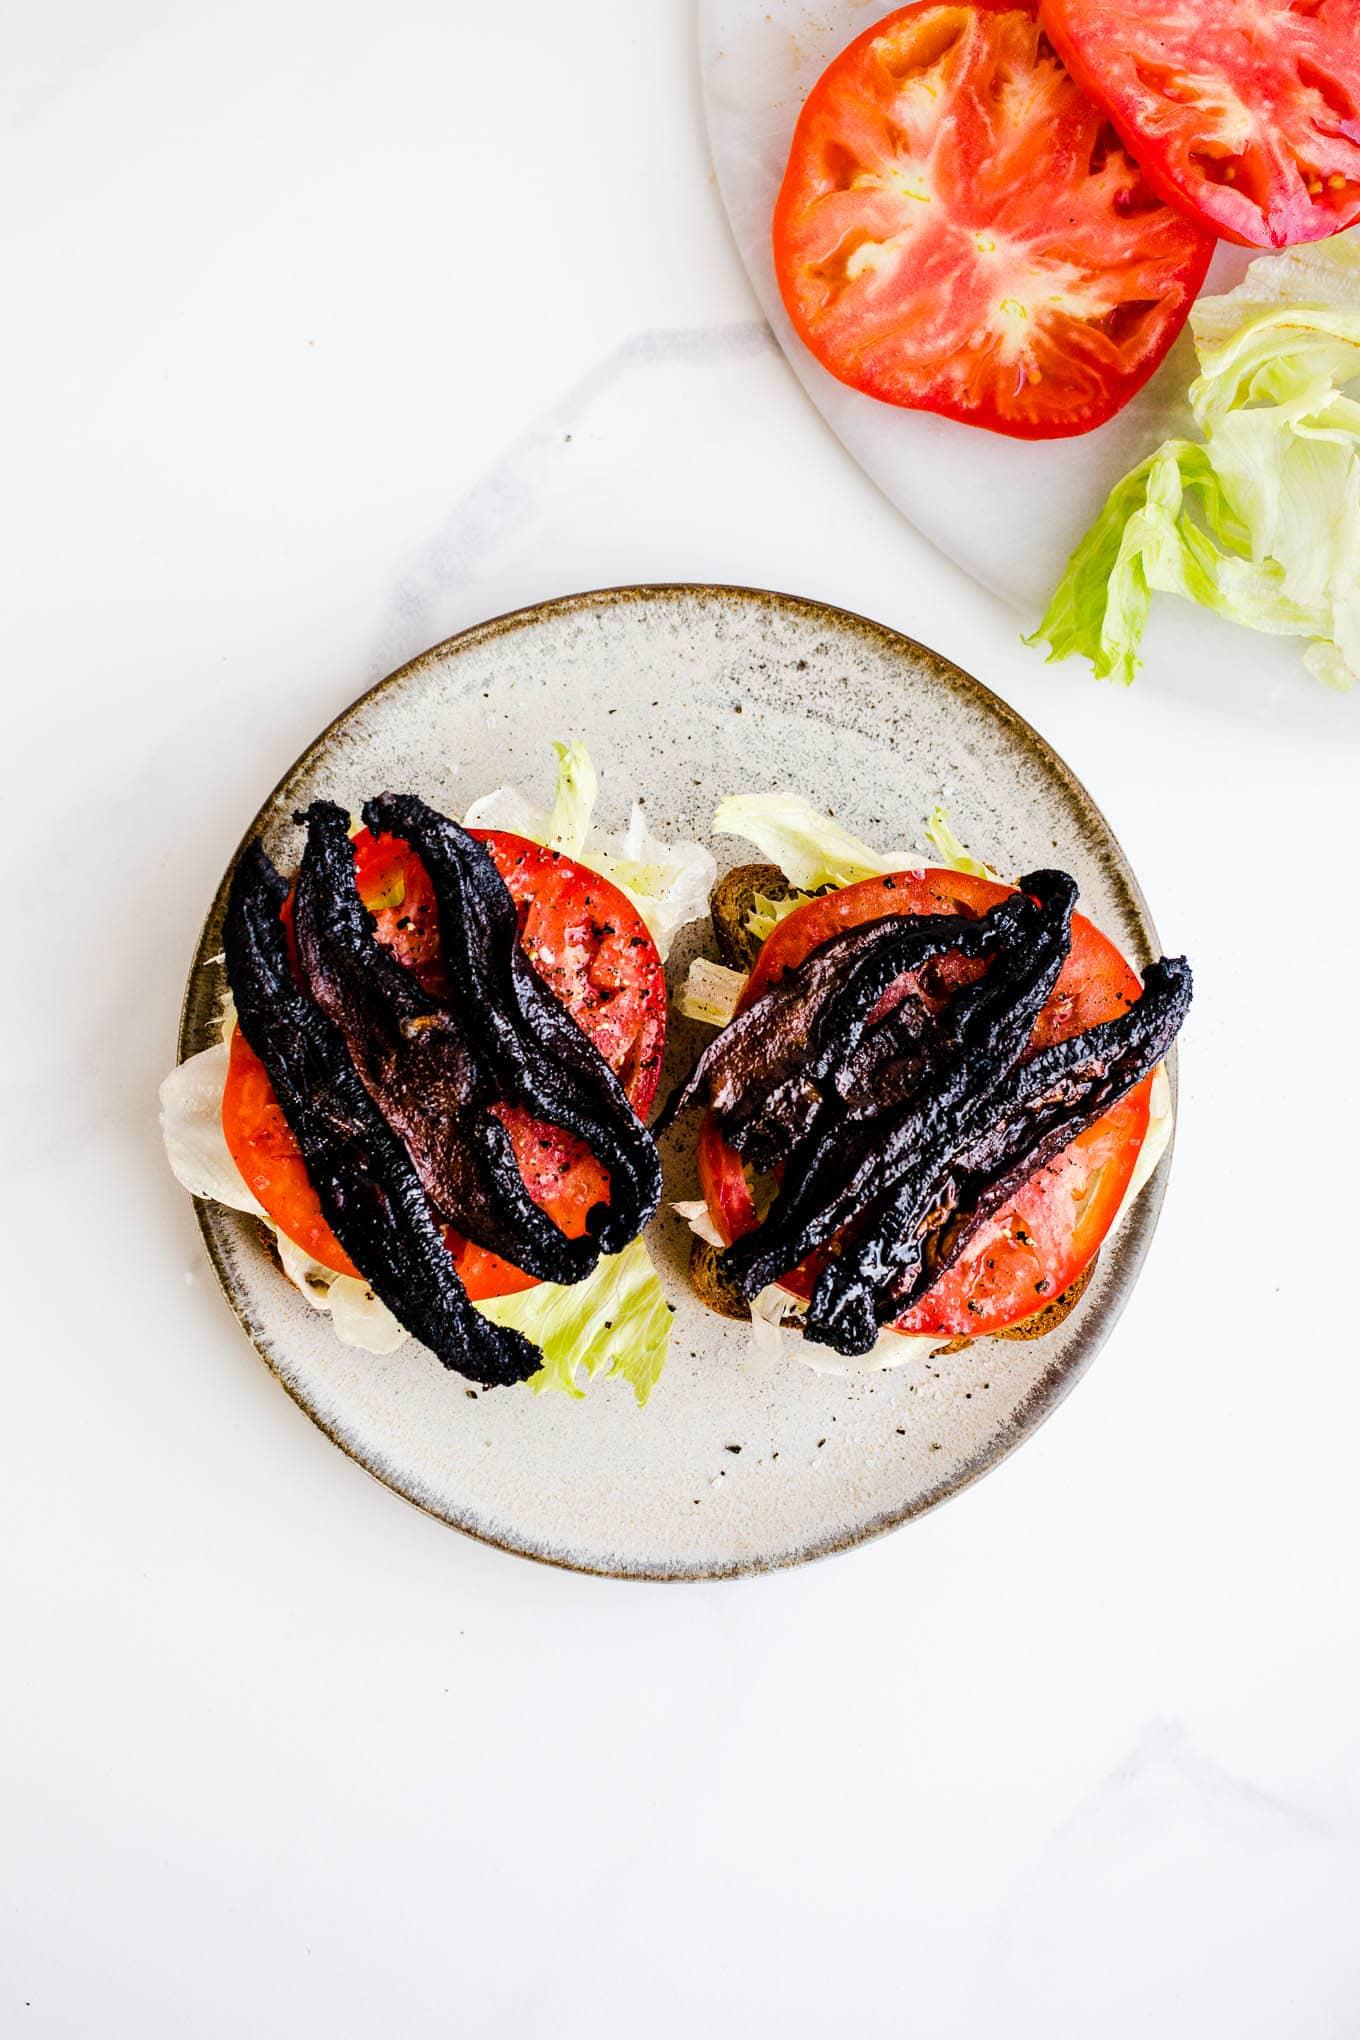 mushroom bacon on tomato and lettuce